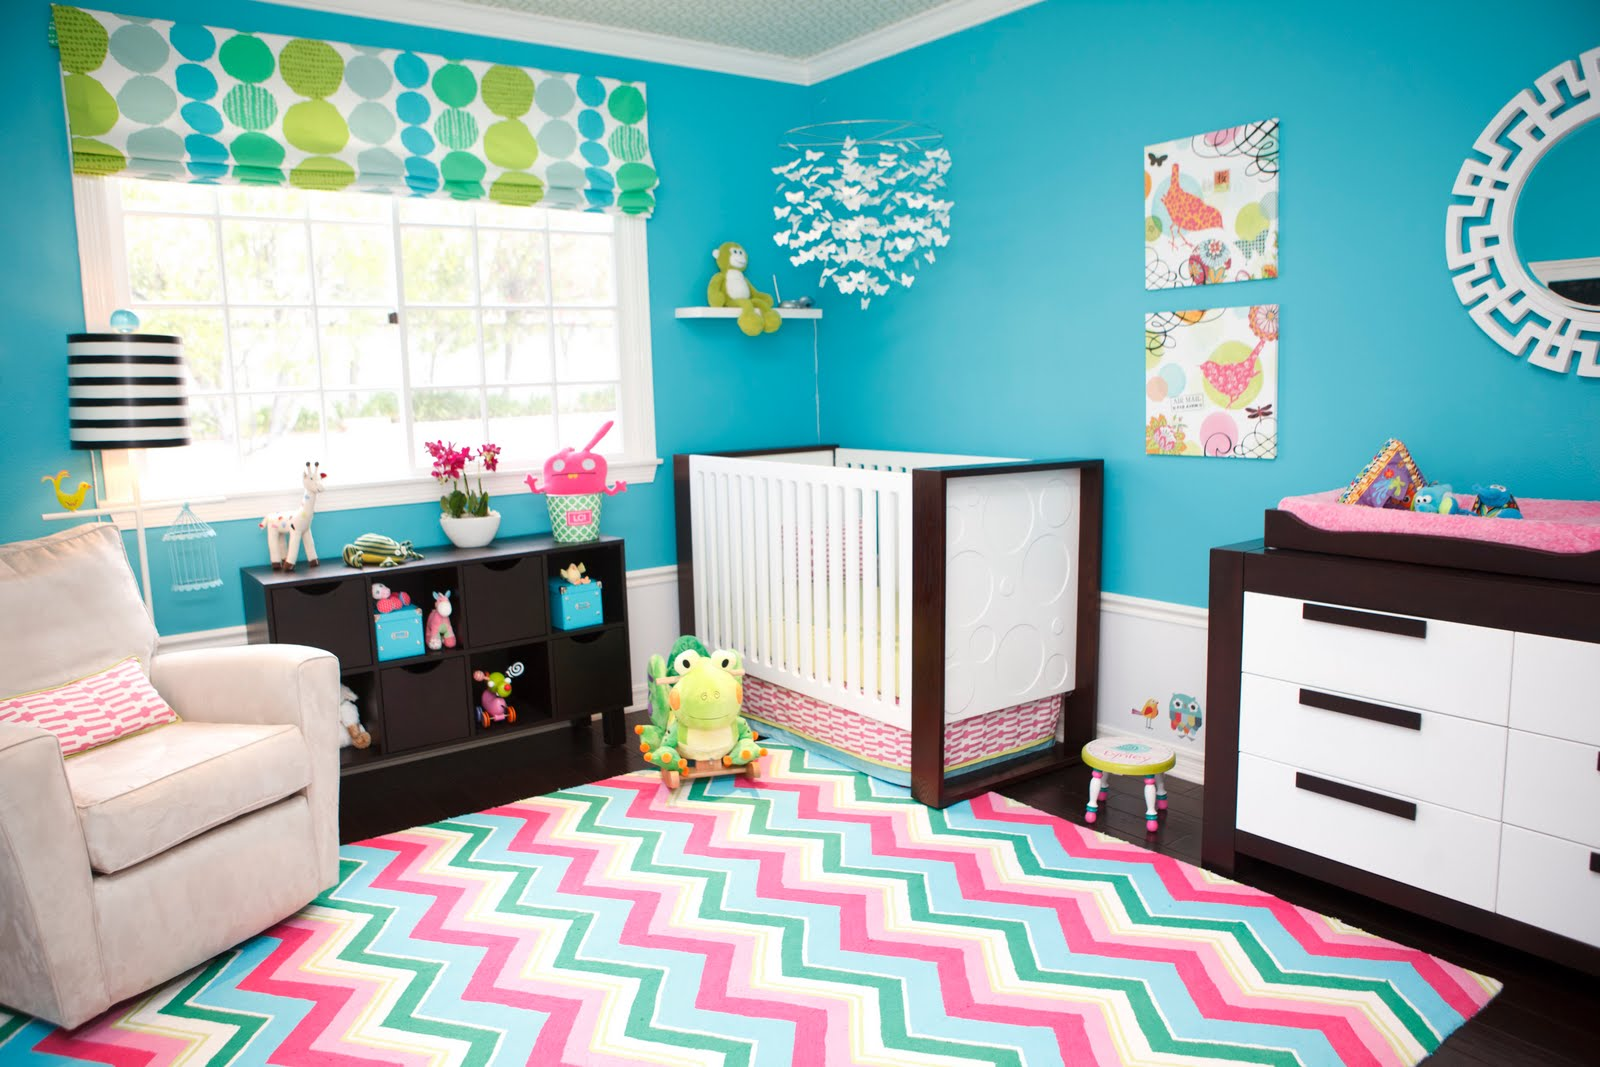 Комната в бирюзовых цветах дизайн